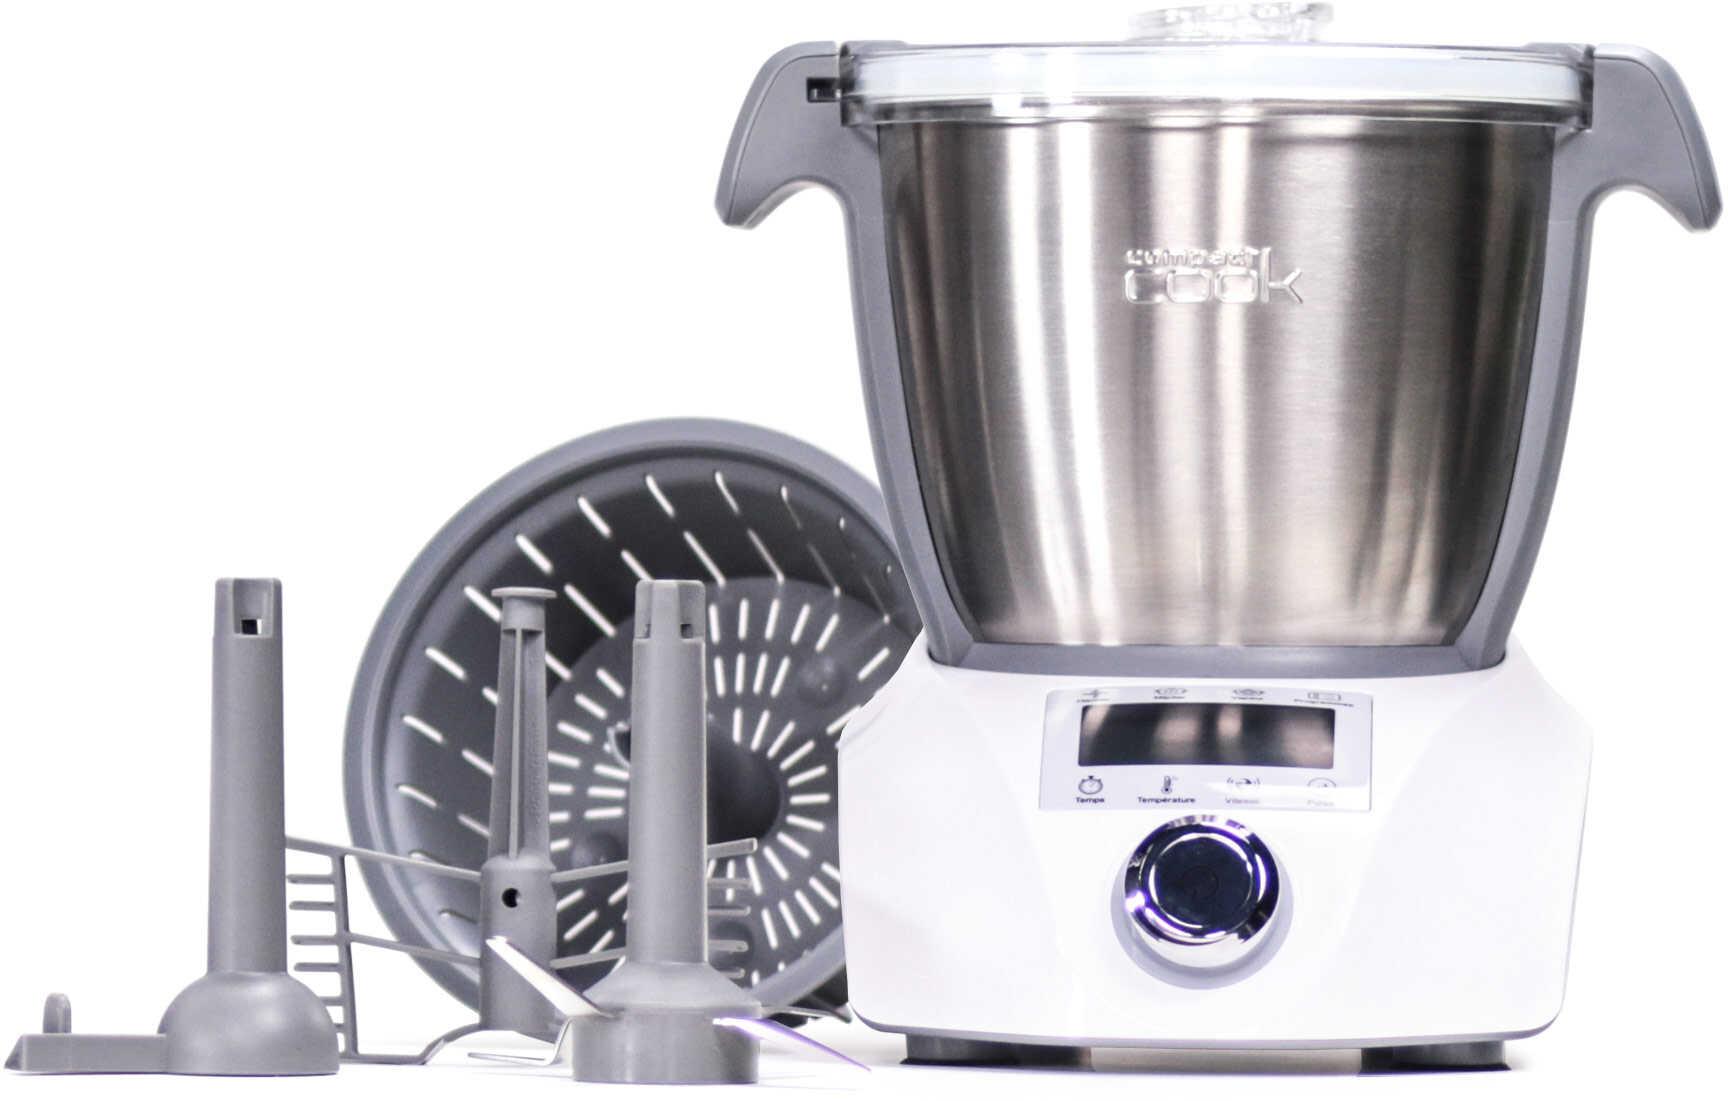 Delimano Wielofunkcyjny robot kuchenny Compact Cook